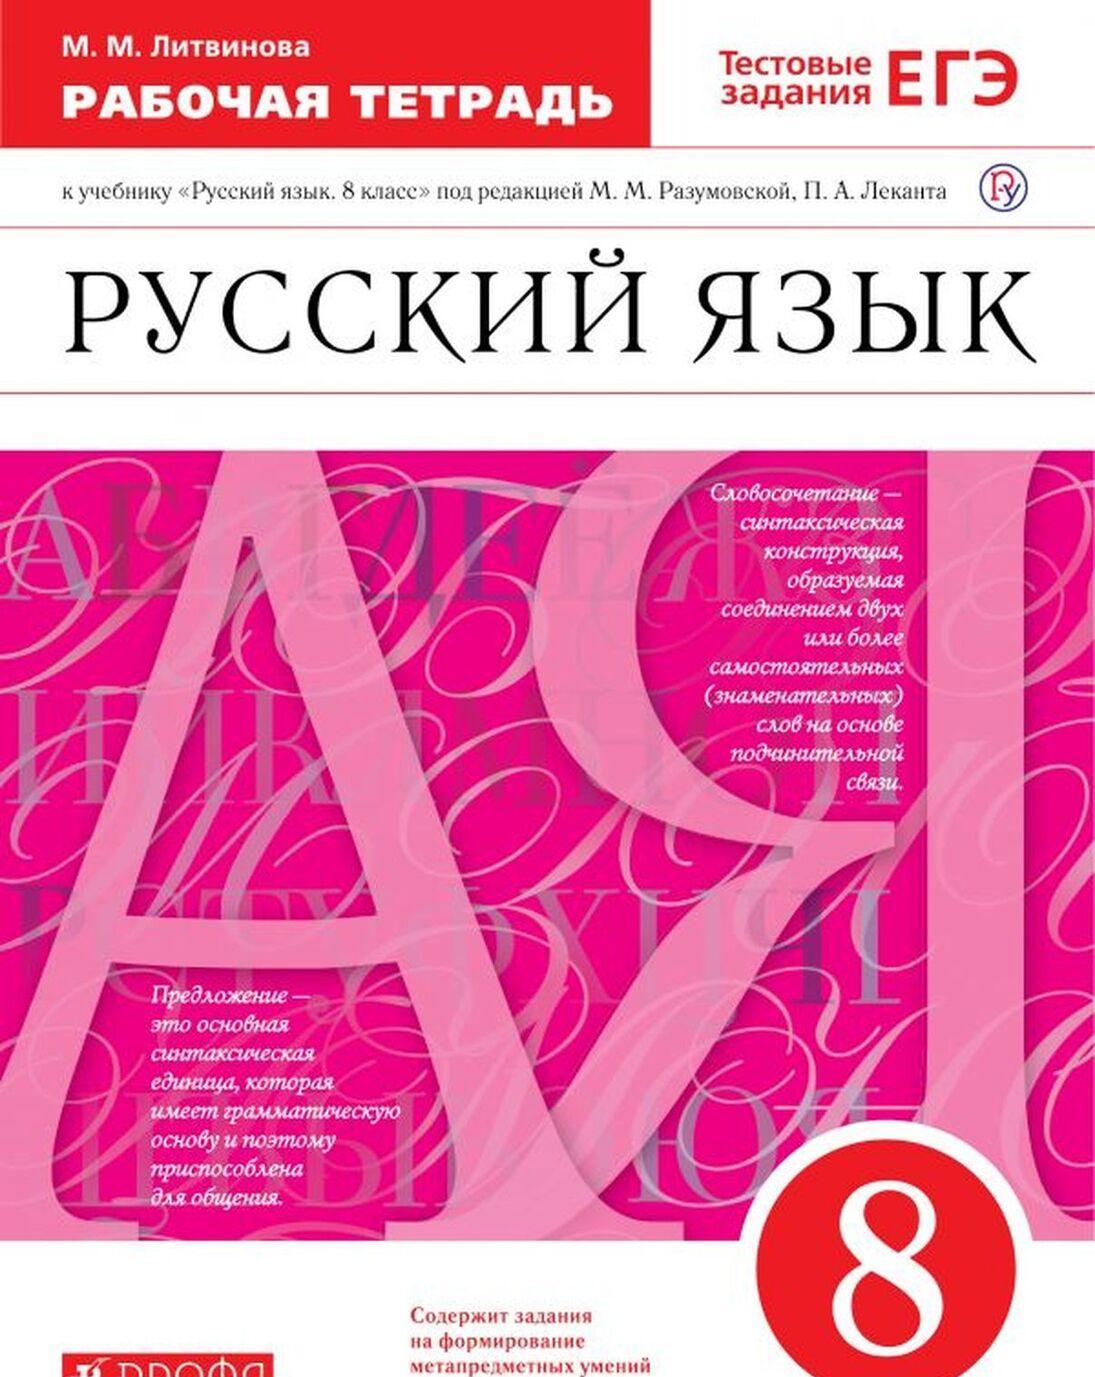 Russkij jazyk. 8 klass. Rabochaja tetrad k uchebniku pod red. M. M. Razumovskoj, P. A. Lekanta